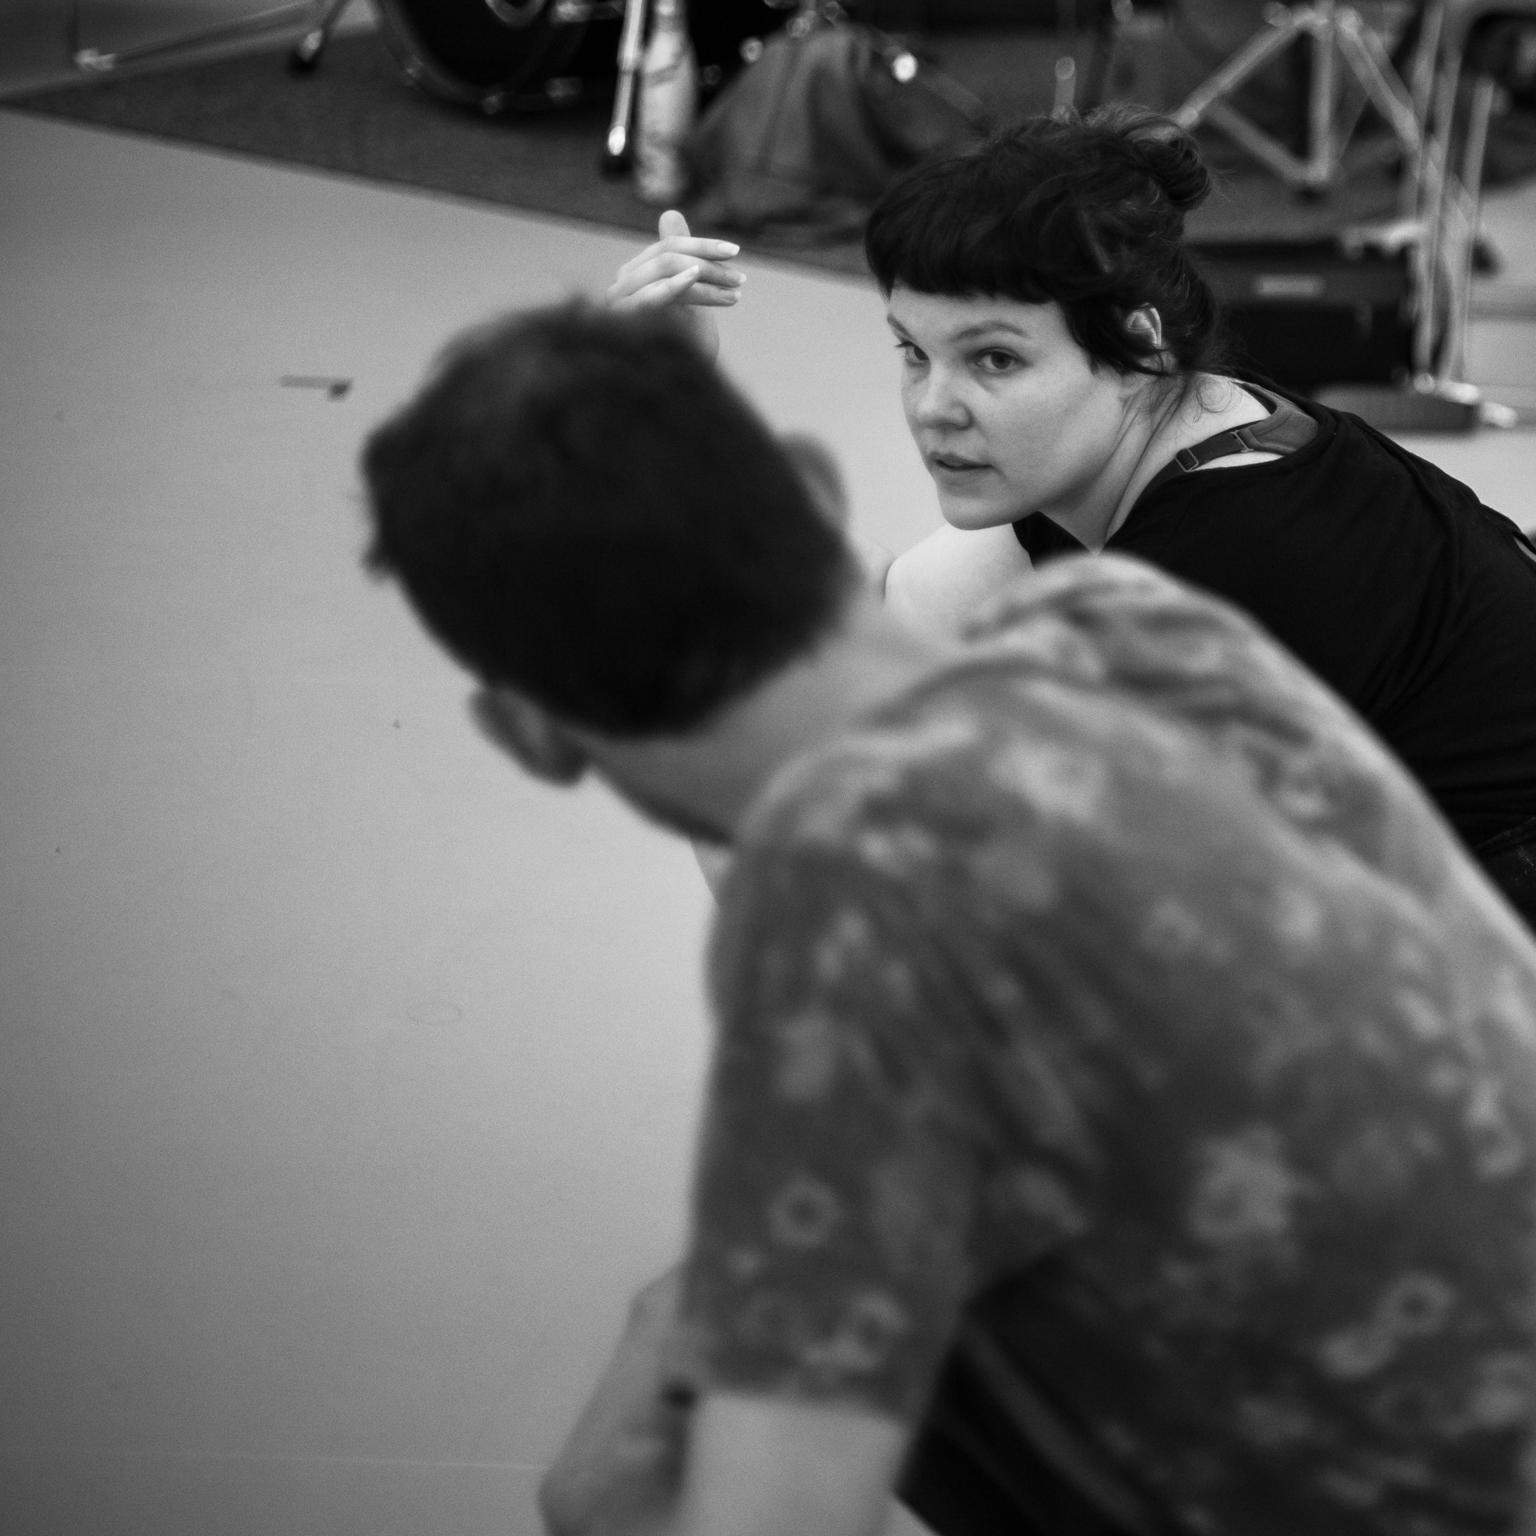 © Anne-Flore de Rochambeau // TransFormation Danse 2017 | David Albert-Toth, Emily Gualtieri